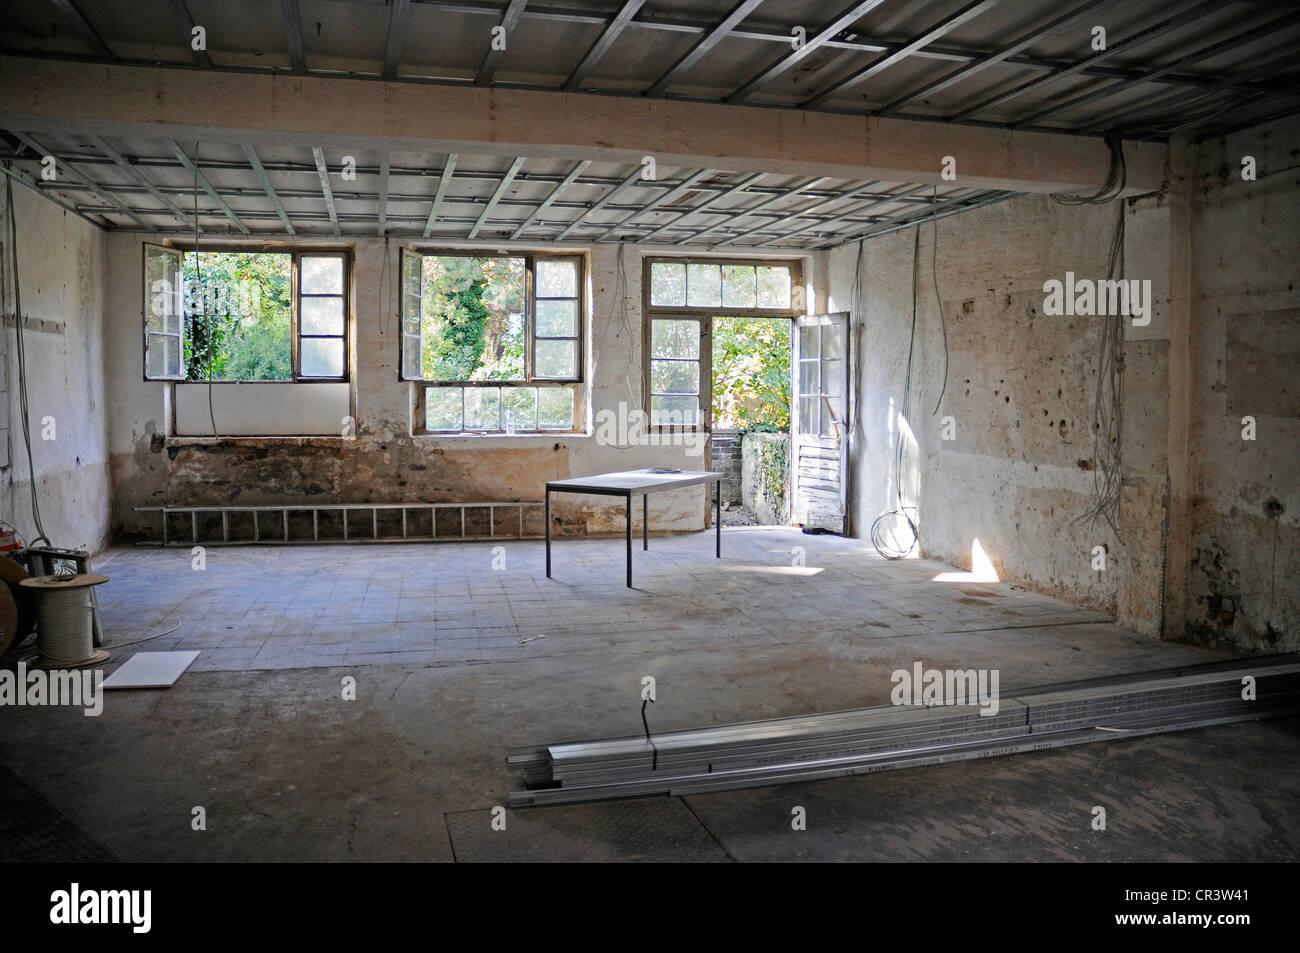 Fenster, Decke, Altbau, Sanierung, Wohnungsbau, Hausbau, Baustelle